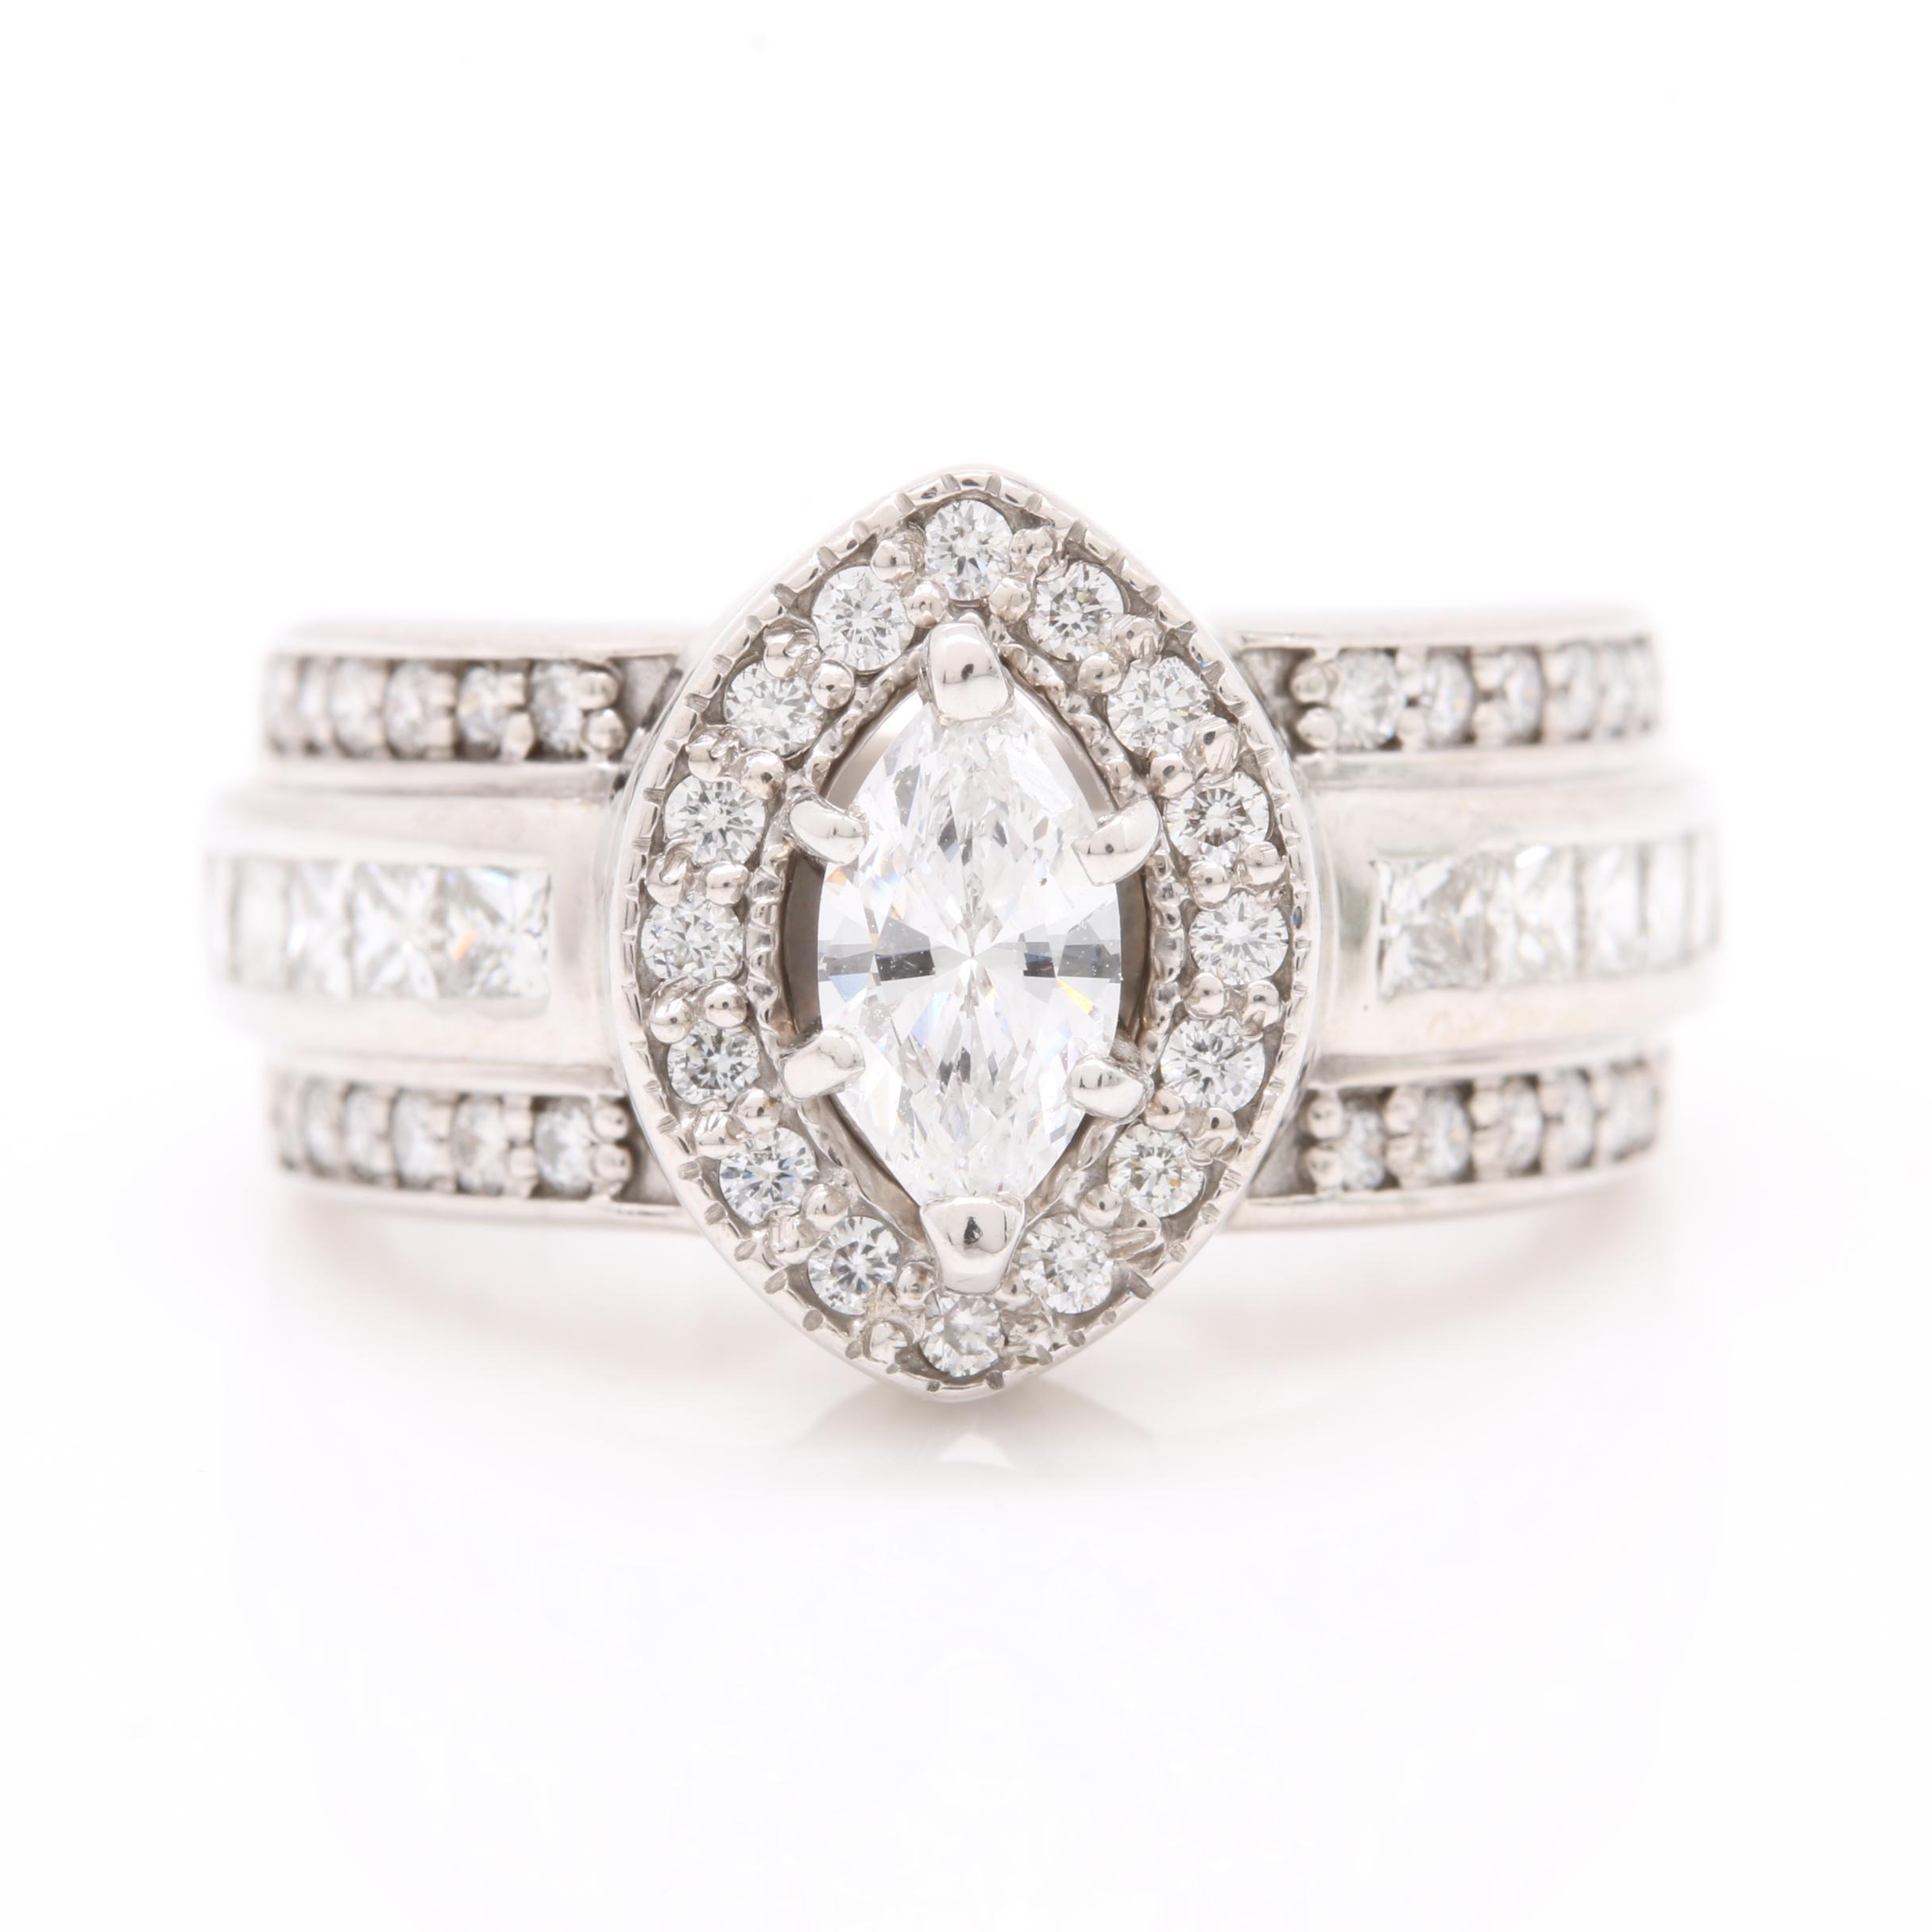 14K White Gold 1.81 CTW Diamond Ring